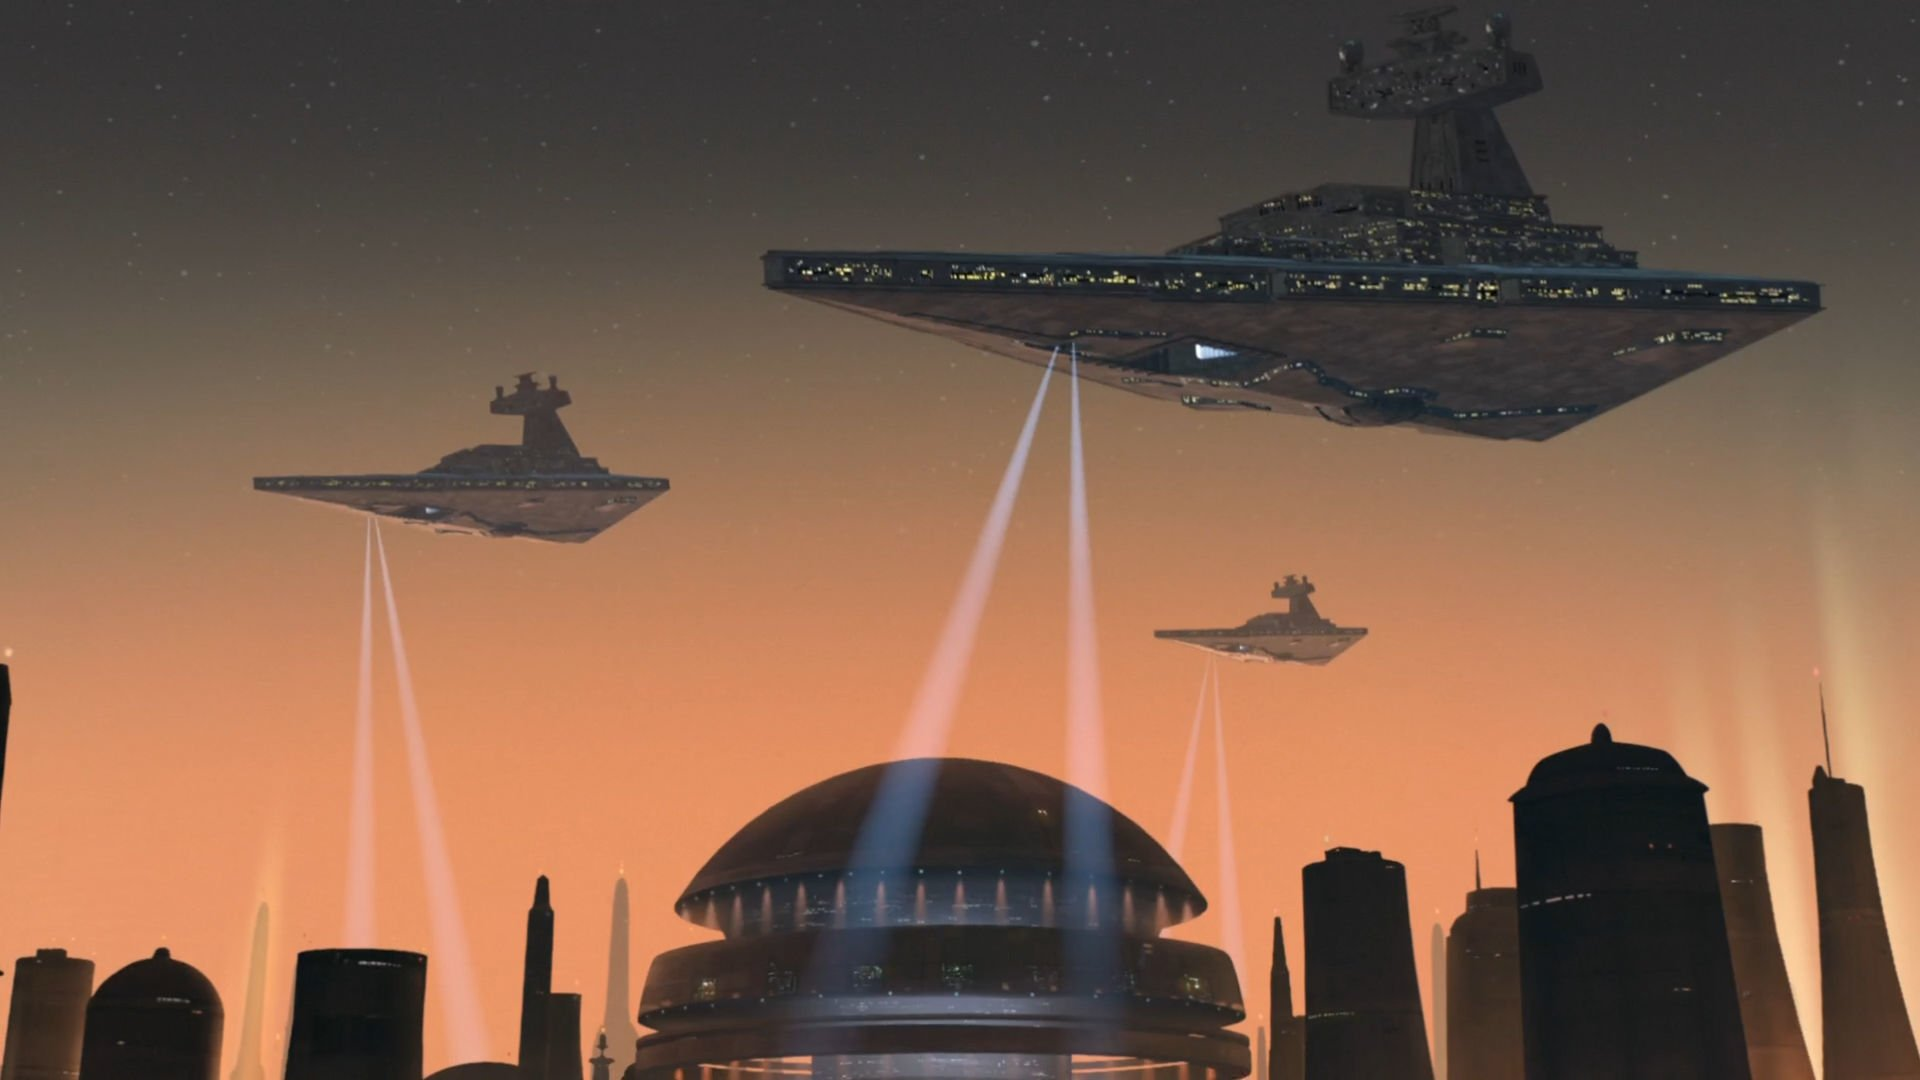 Star Wars Rebels Hd Wallpaper Background Image 1920x1080 Id 669183 Wallpaper Abyss